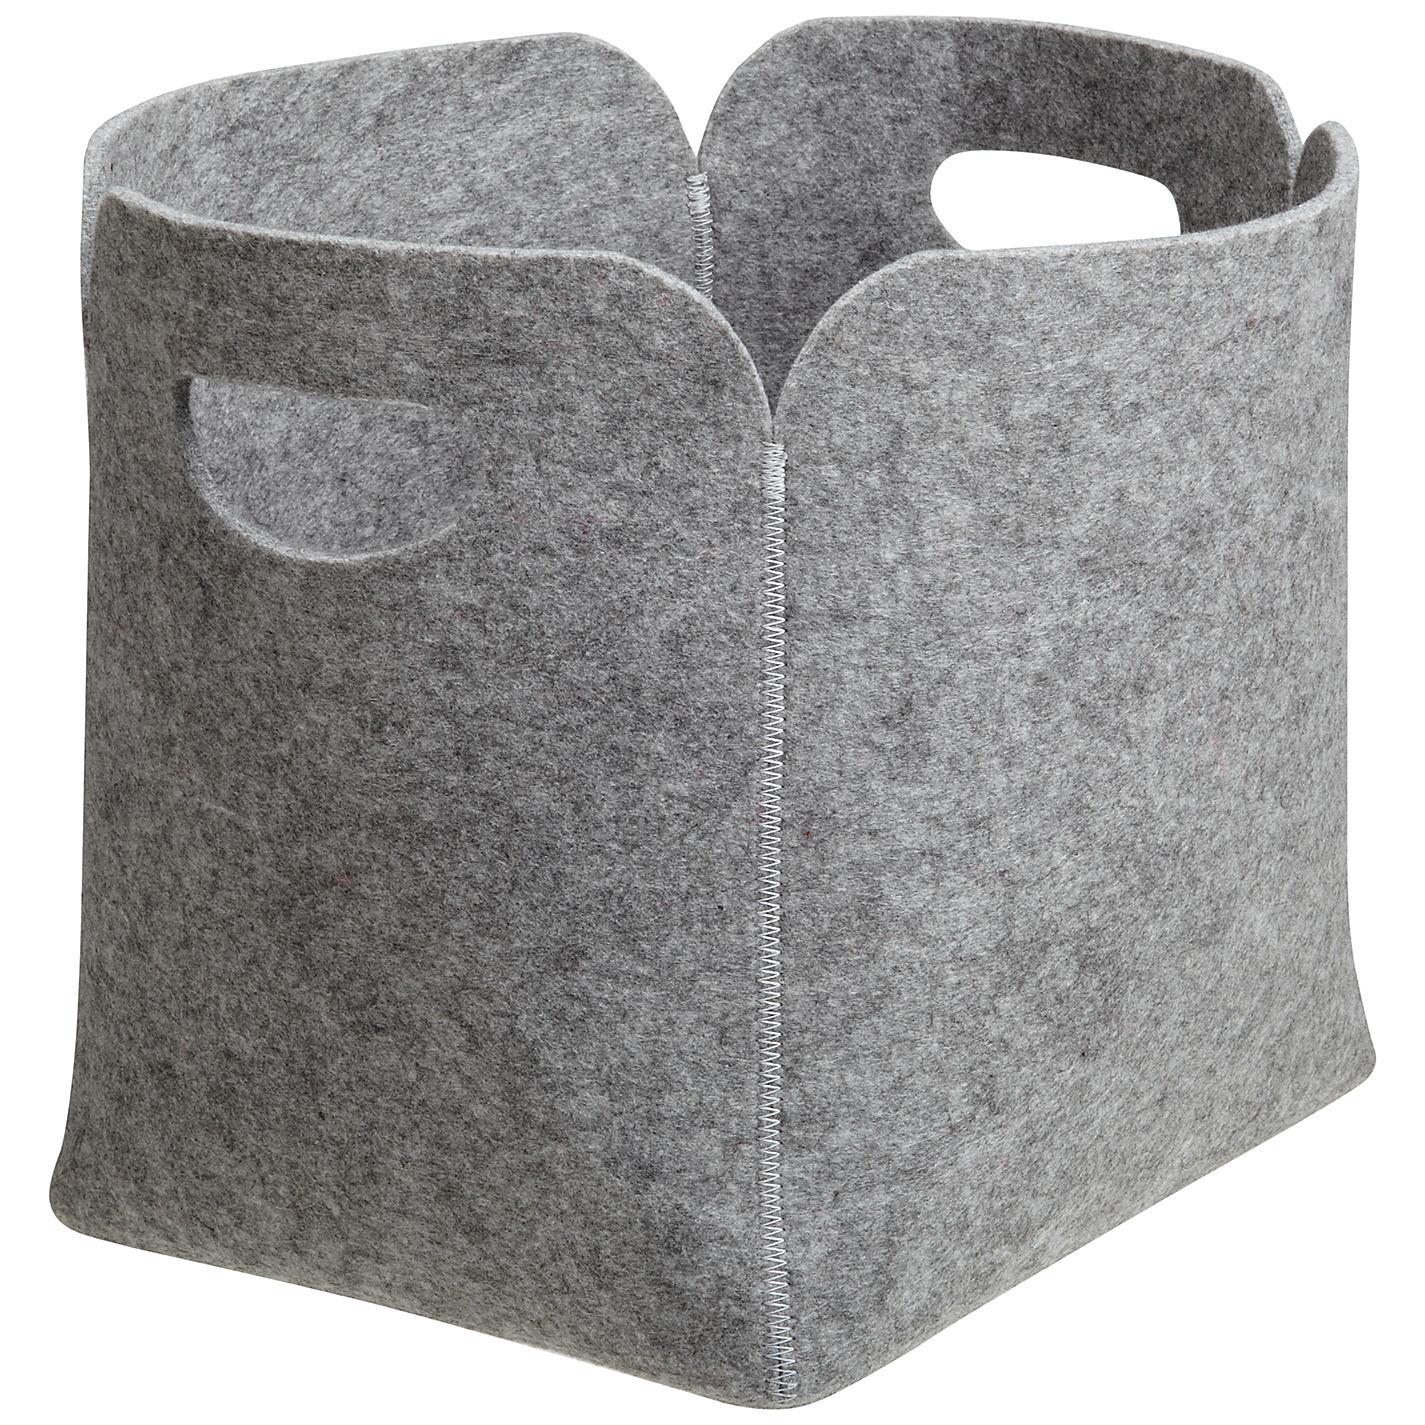 Felt Storage Bin In Grey With Handle For Home Storage Ideas